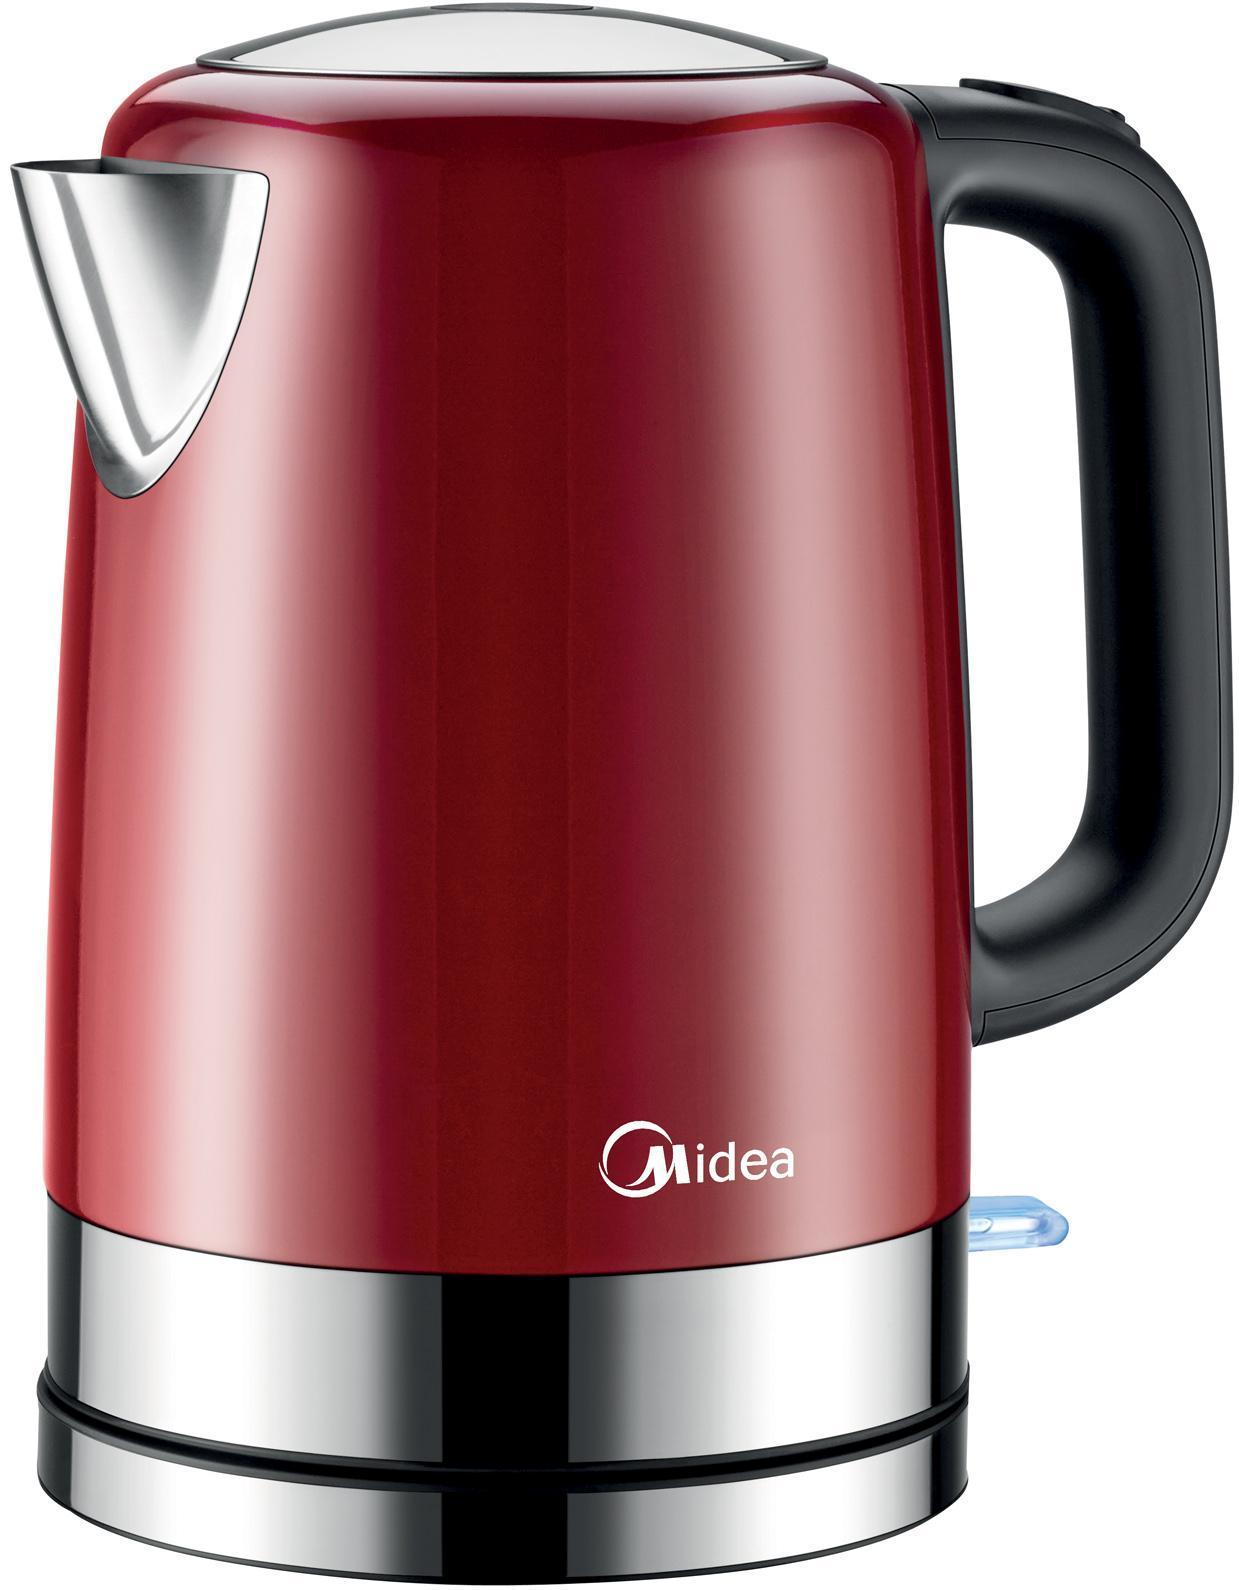 Midea MK-M317C2A-RD, Red электрический чайник